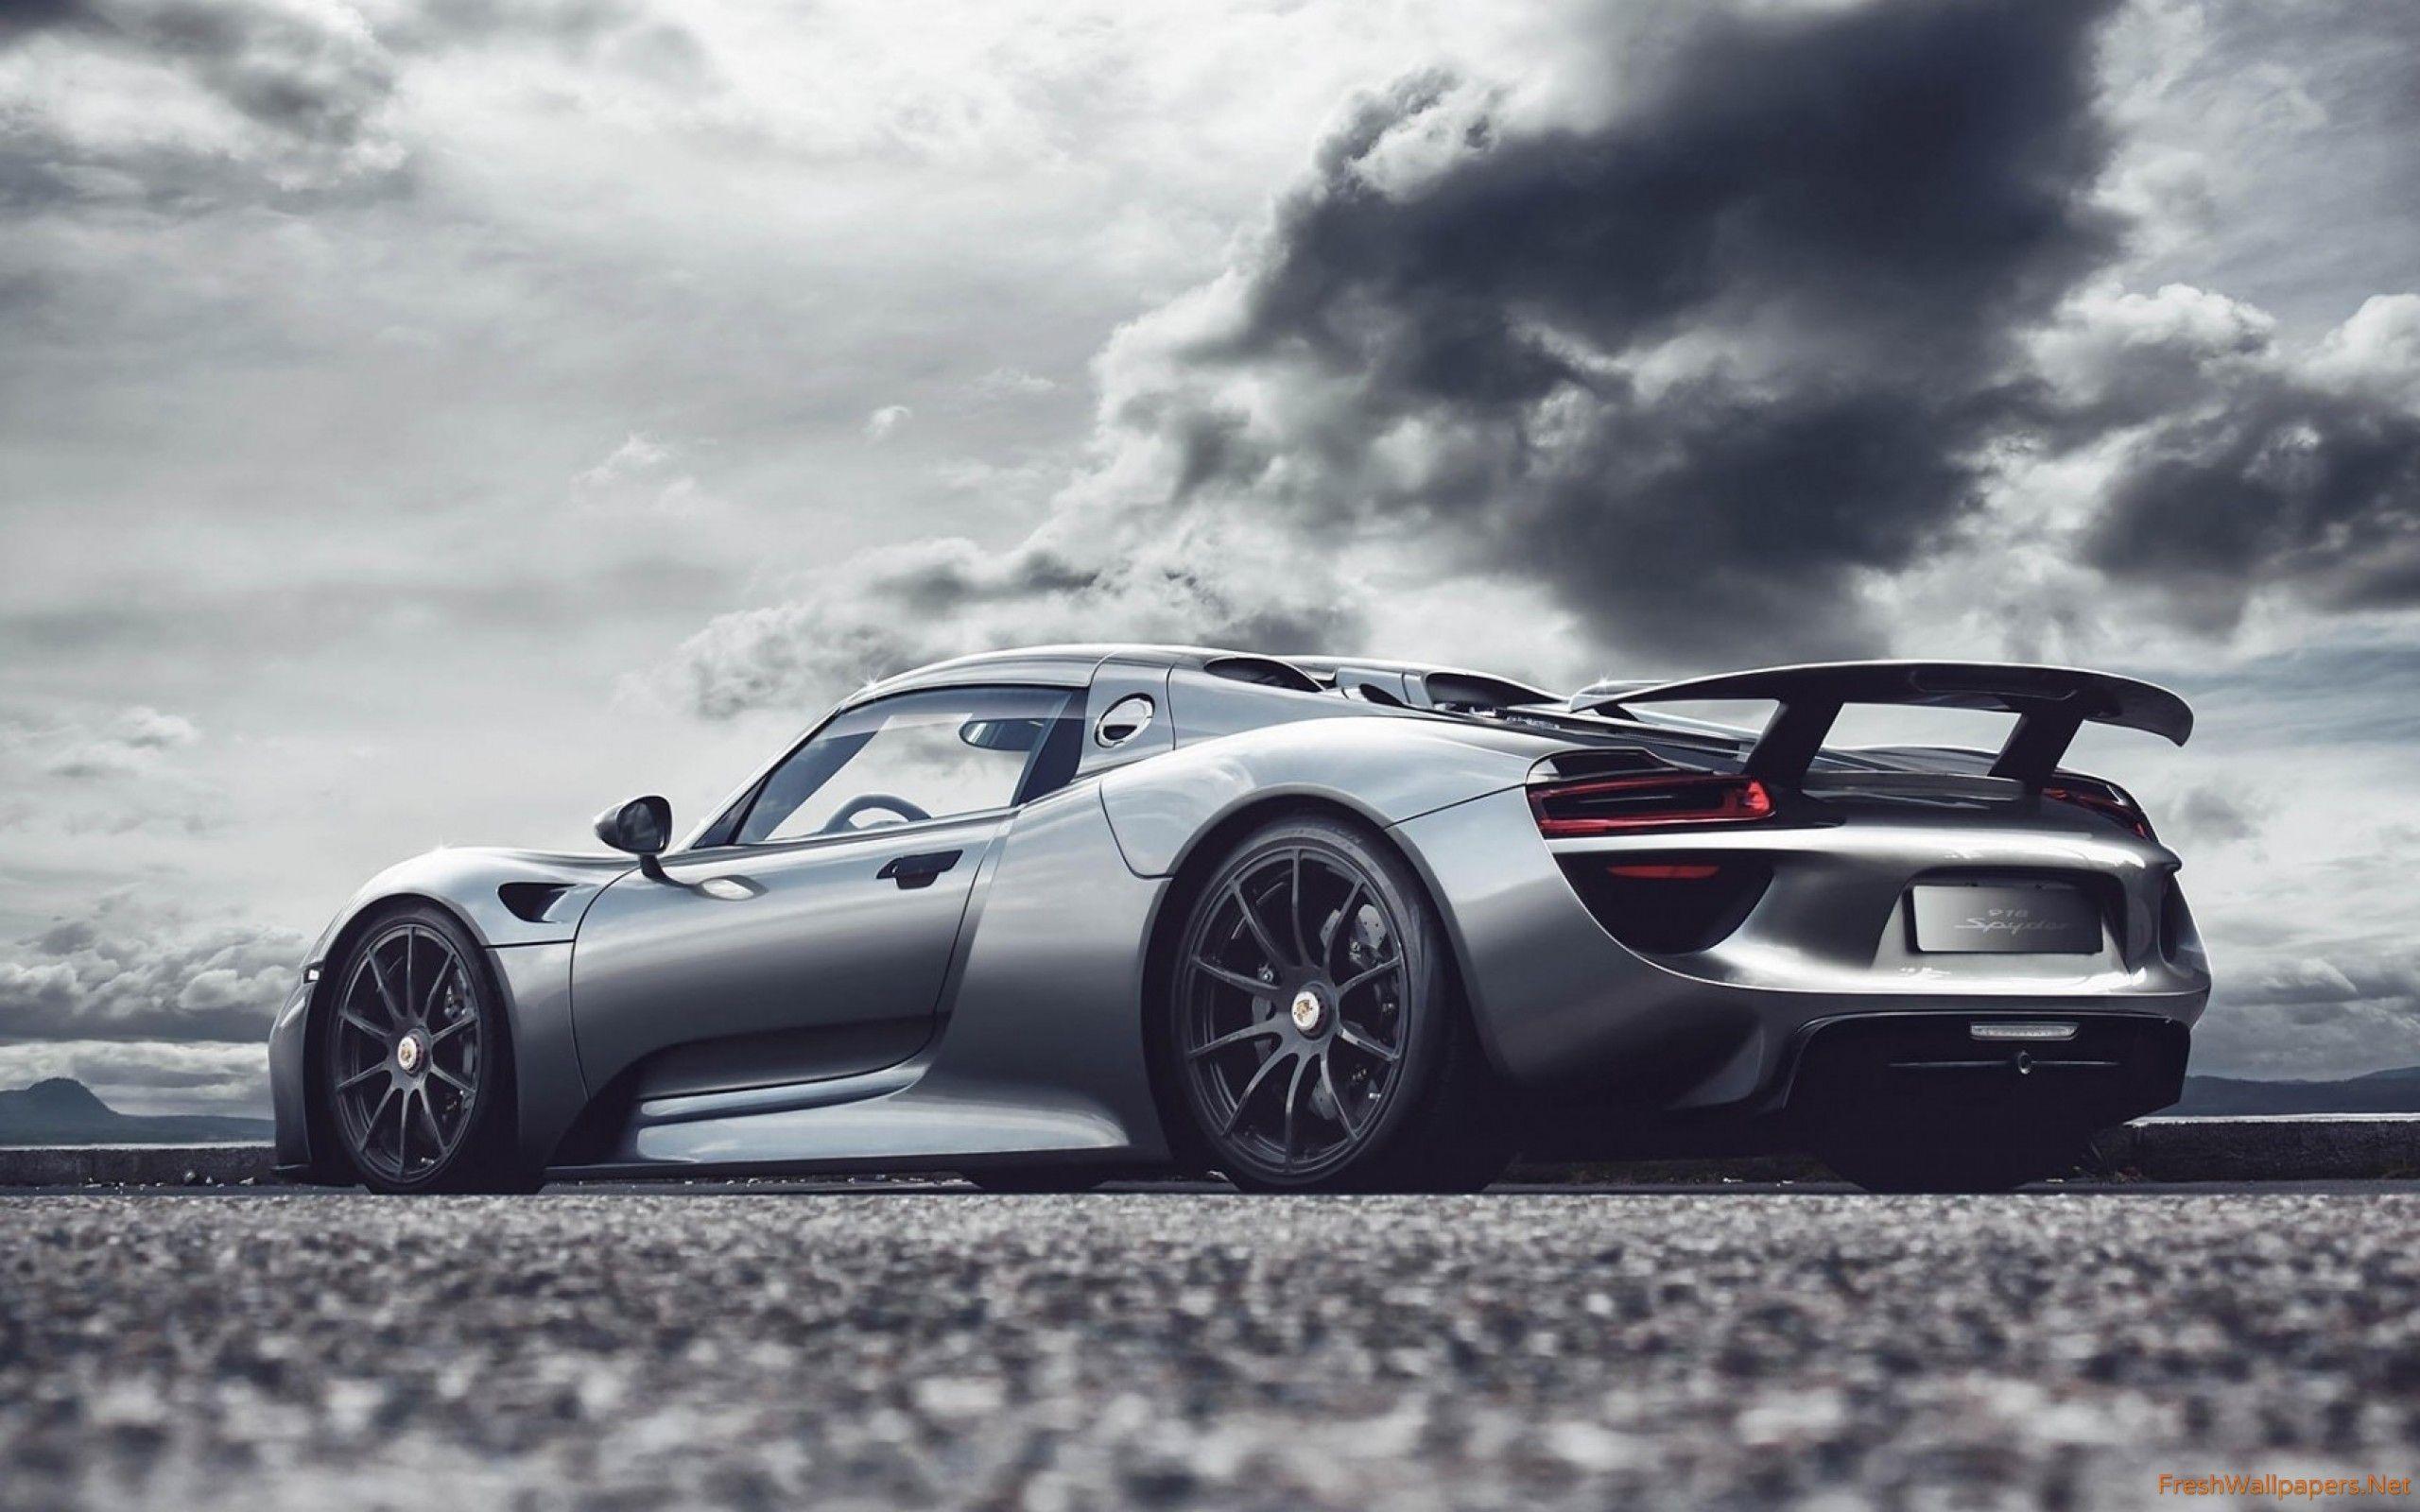 9bd2d8a47e384888a79e6336421932df Gorgeous Porsche 918 Spyder High-performance Concept Cars Trend